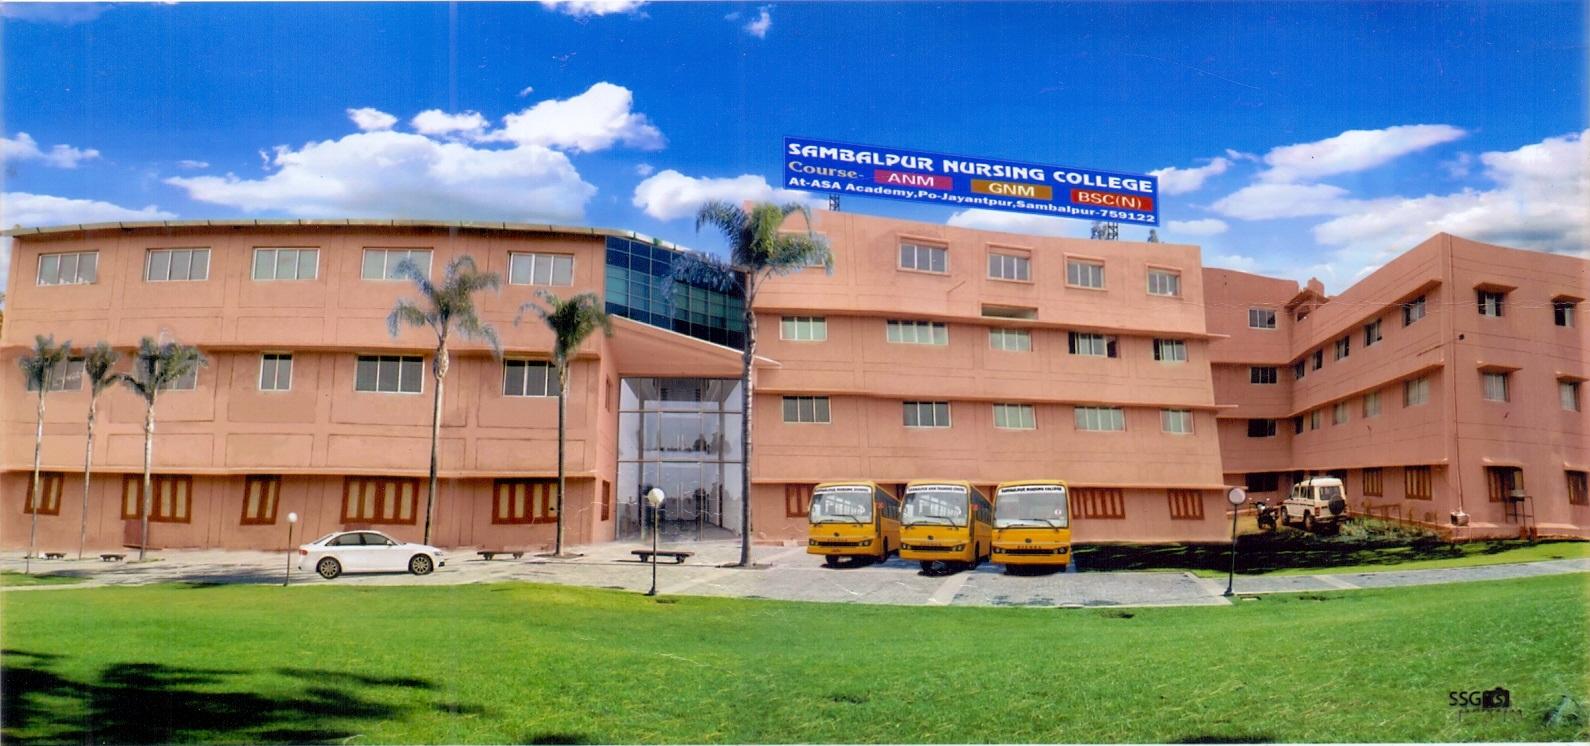 Sambalpur Nursing College